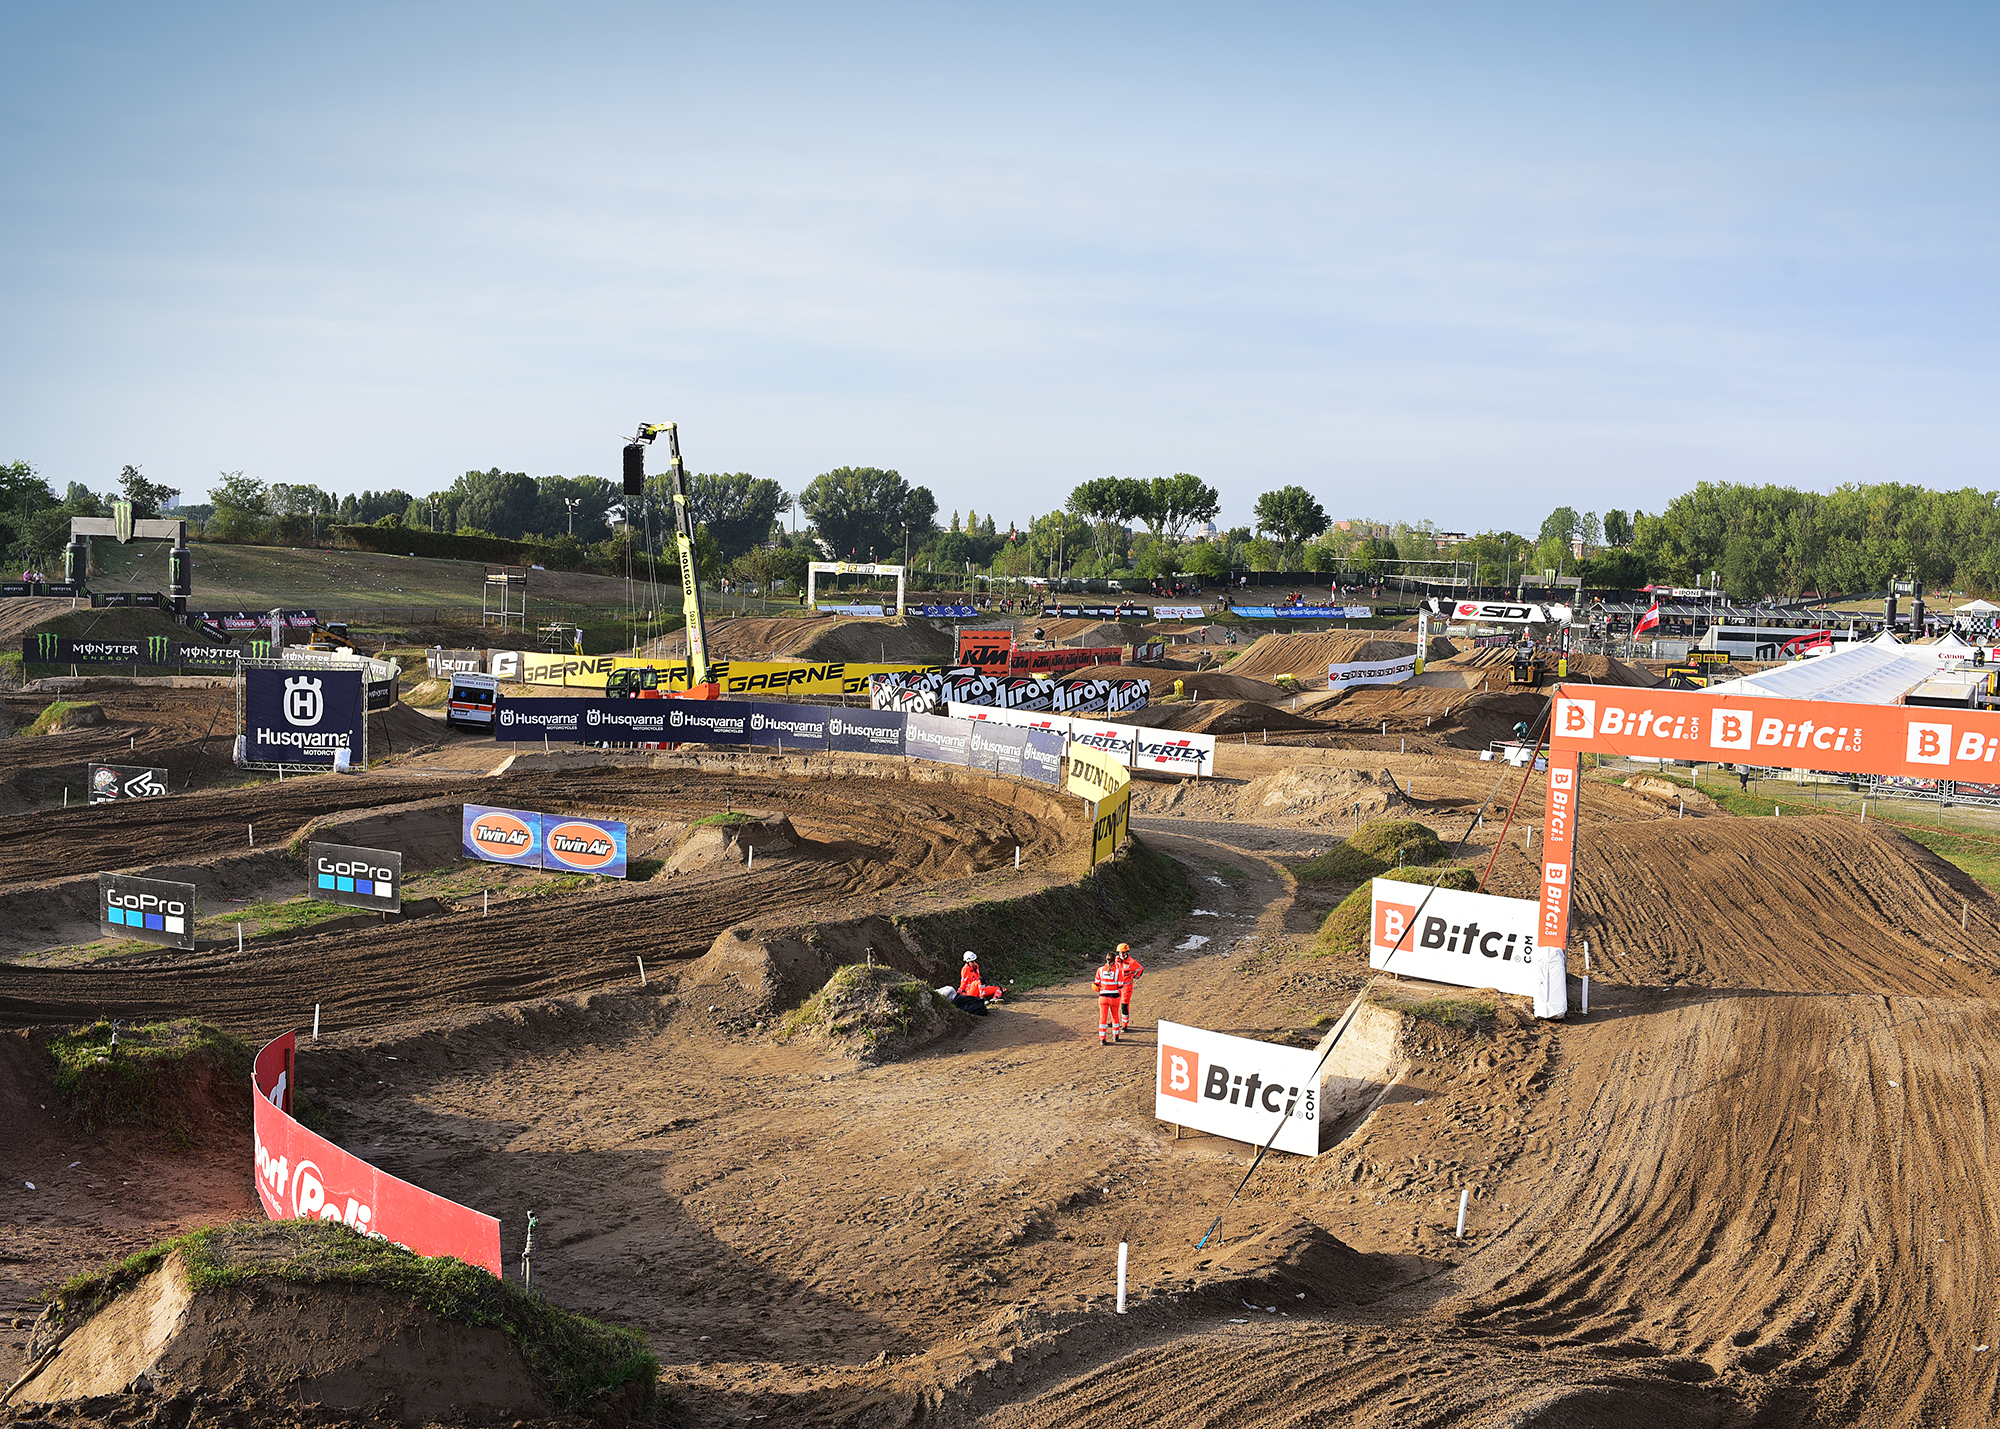 Mantova Motocross Track, 2021